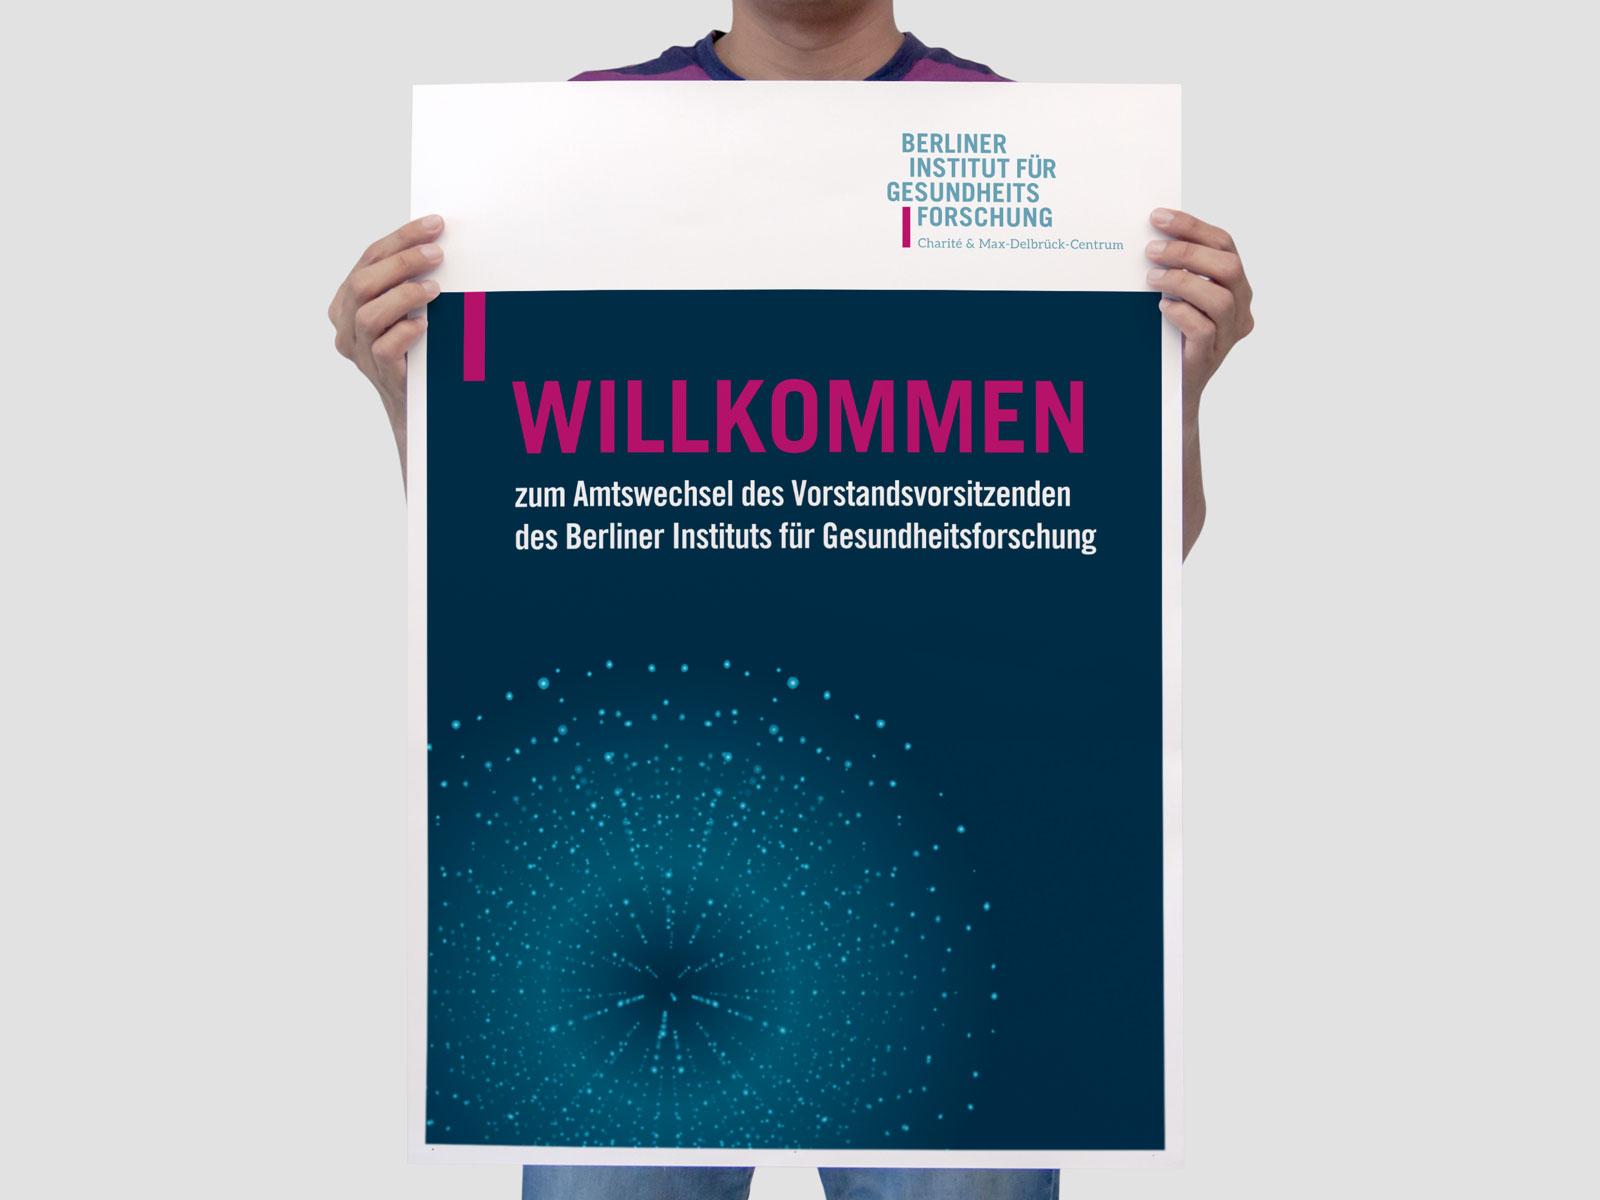 portfiolio_kromativ_poster_branding_veranstaltung_bih_05